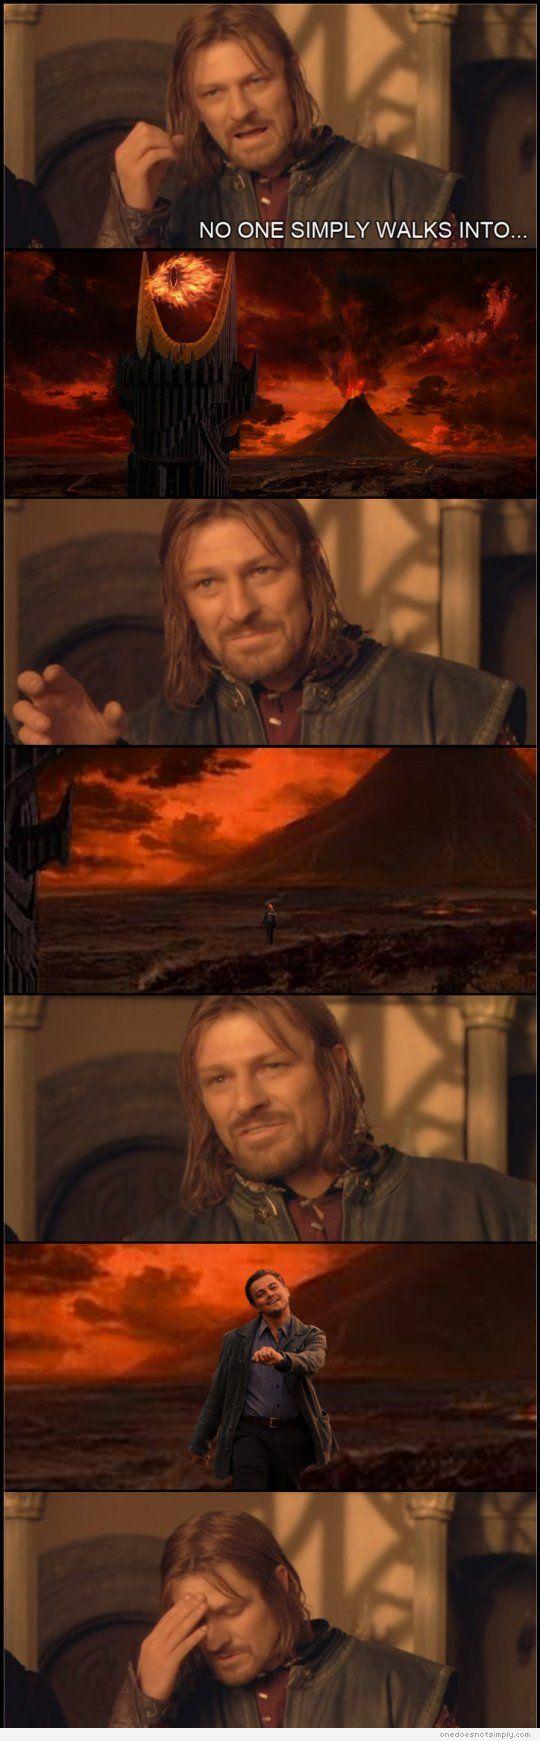 Mordor LOTR #LeonardoDiCaprio Image detail for -One Does Not Strut Into Mordor mordor meme | One Does Not Simply